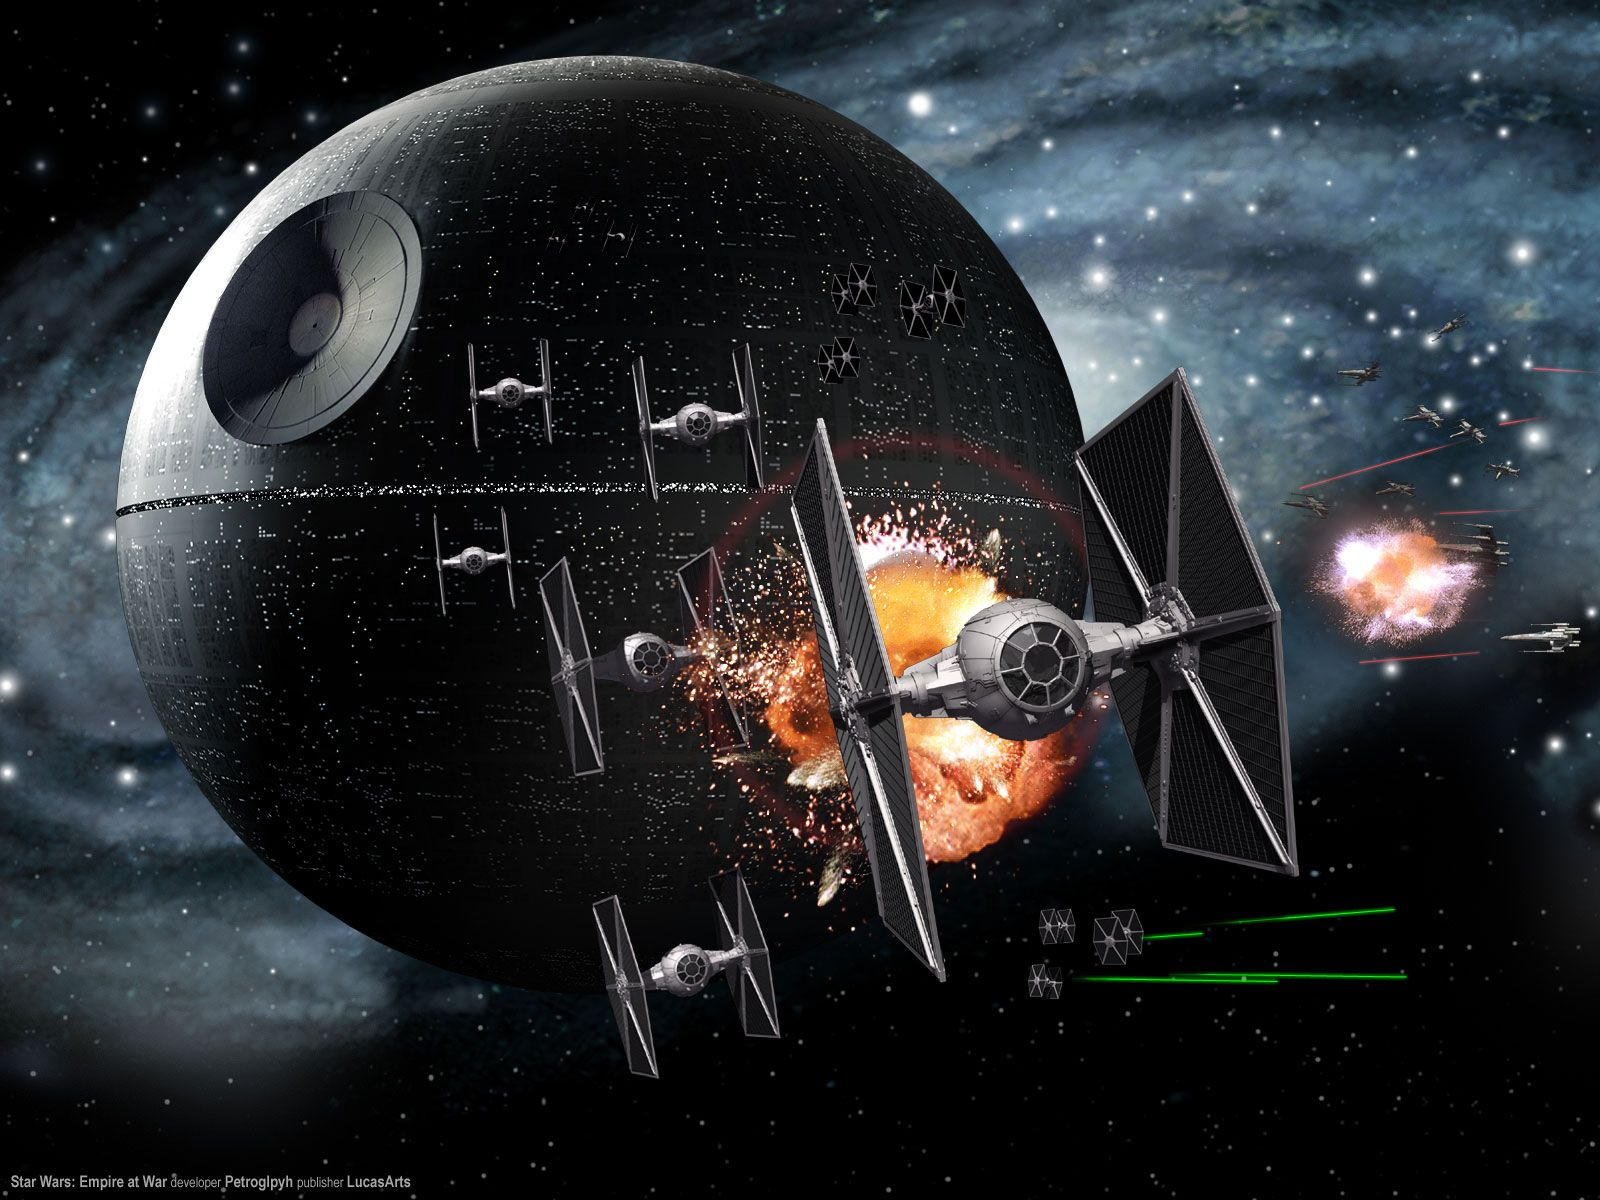 Star wars movie star wars backgrounds hd wallpaper star wars star wars movie star wars backgrounds hd wallpaper voltagebd Gallery